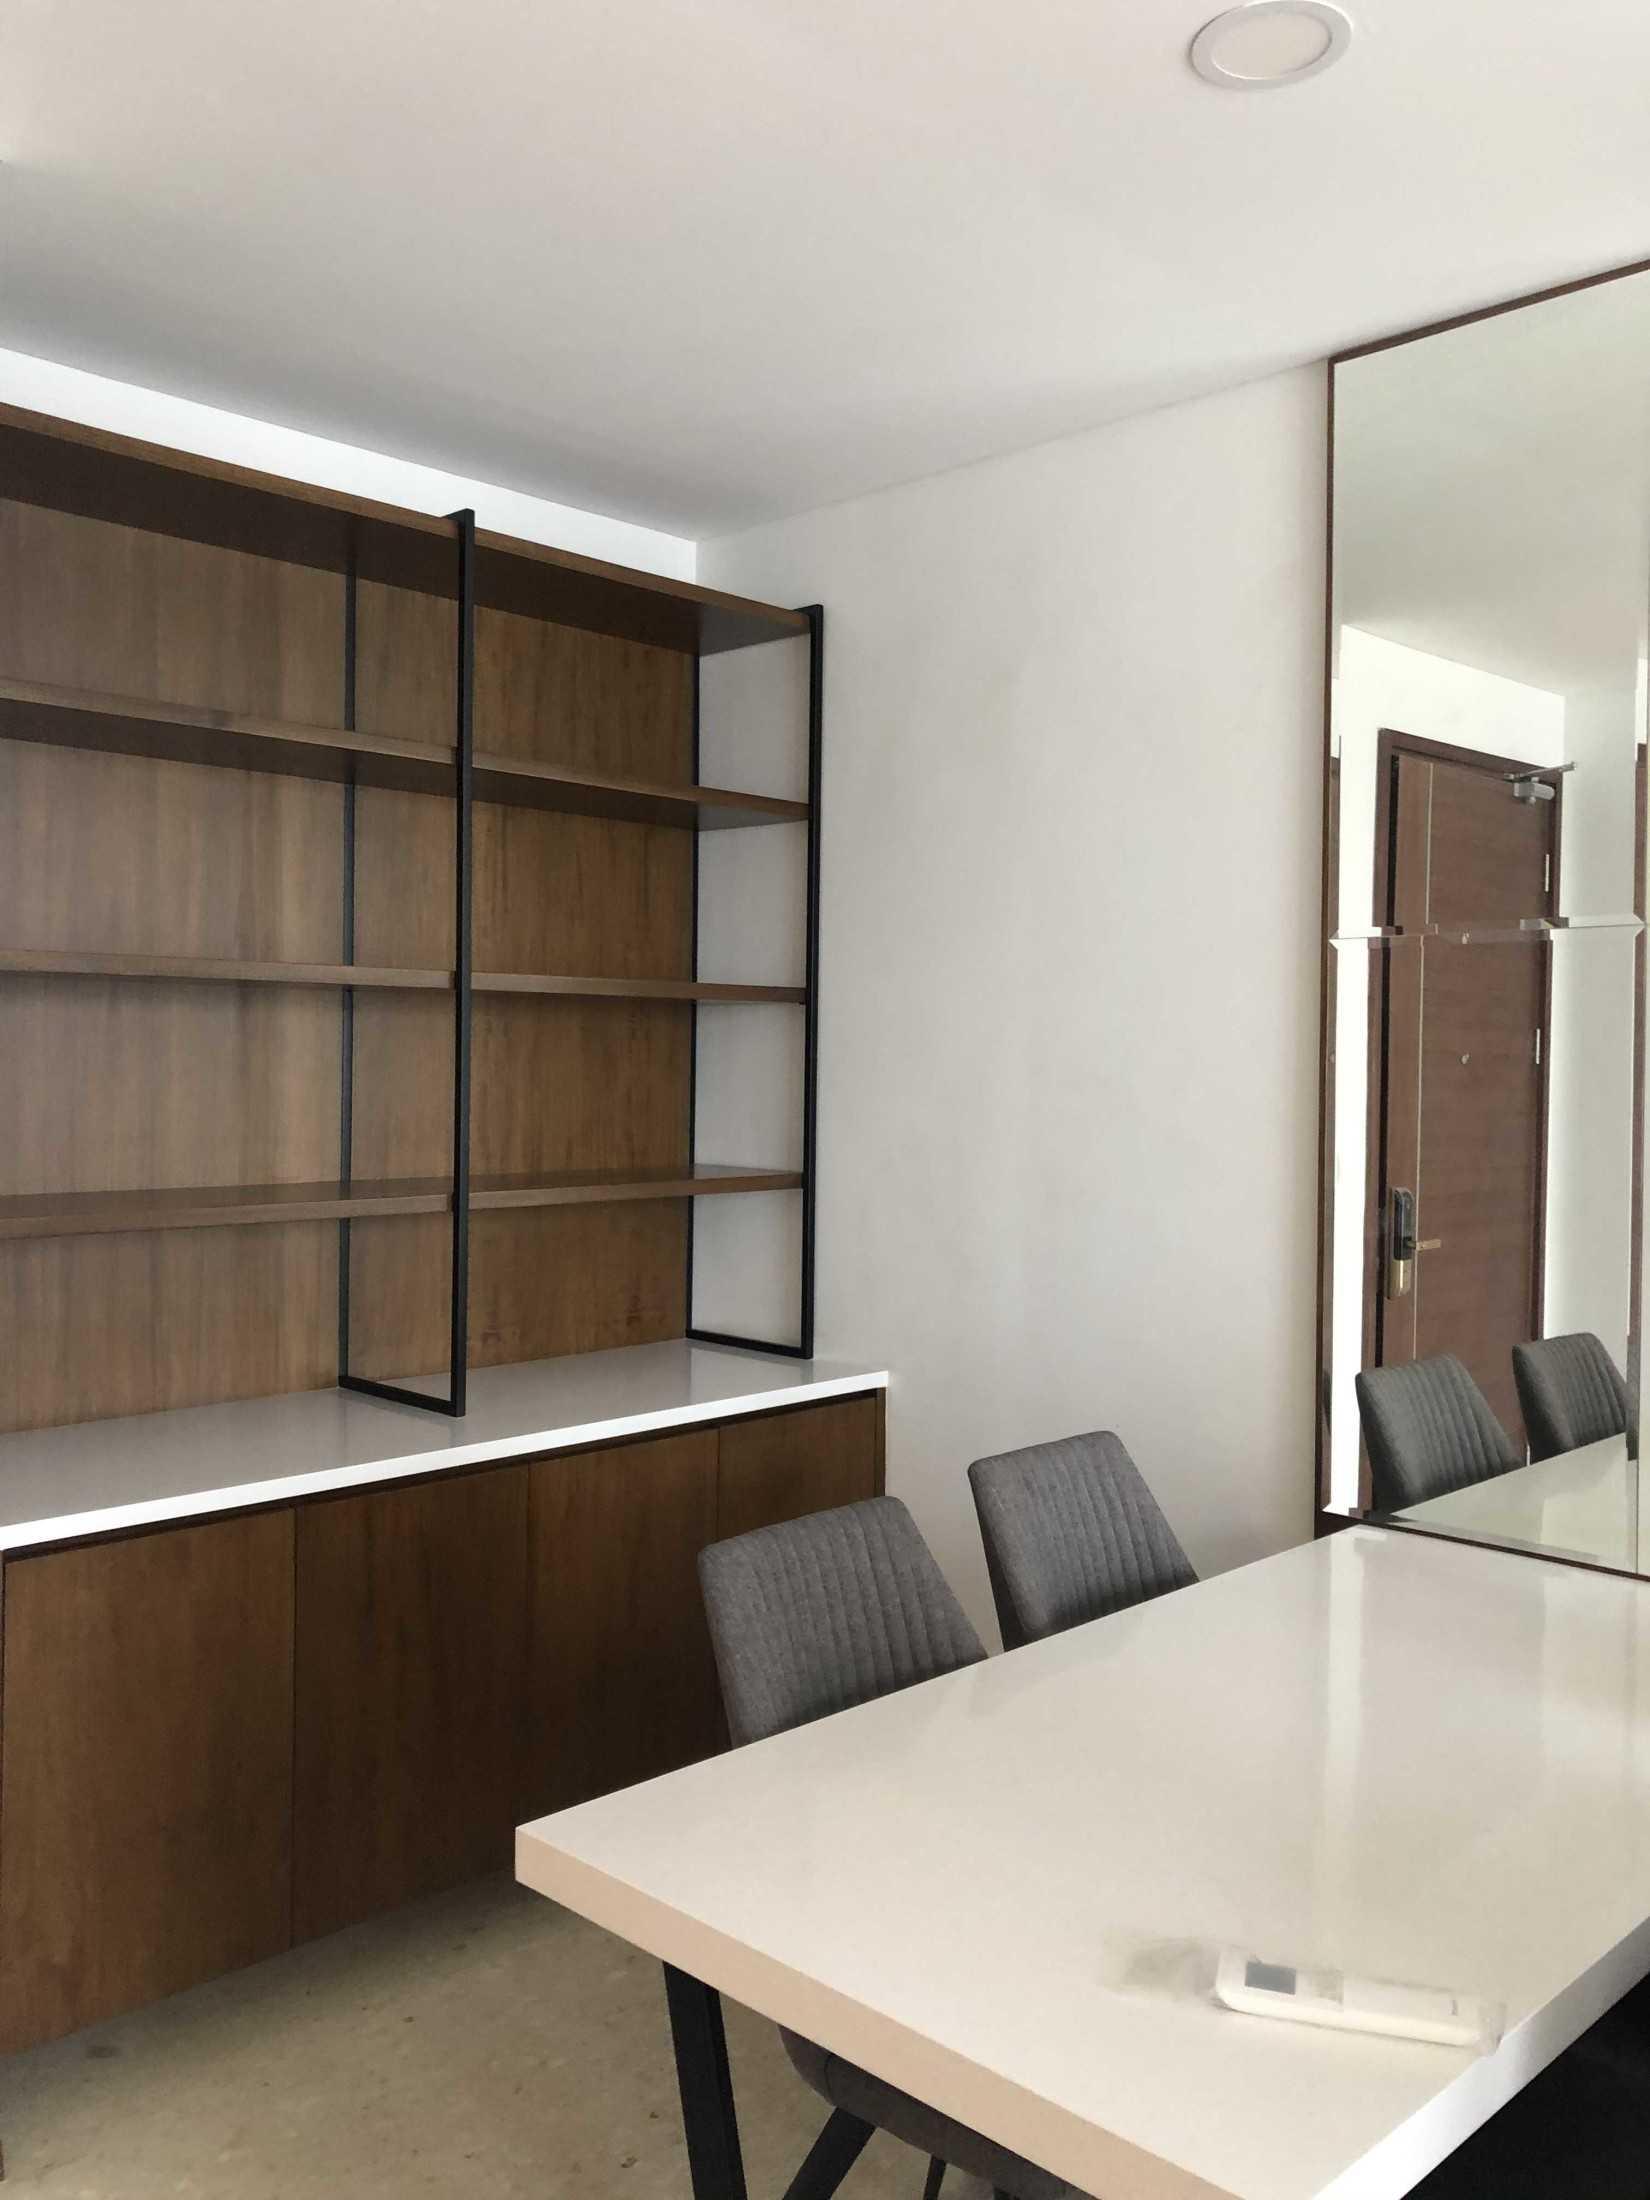 Loop Design/production Wv Apartment Sampora, Kec. Cisauk, Tangerang, Banten 15345, Indonesia Sampora, Kec. Cisauk, Tangerang, Banten 15345, Indonesia Loop-Design-Production-Mrmrs-William-Apartment  120626